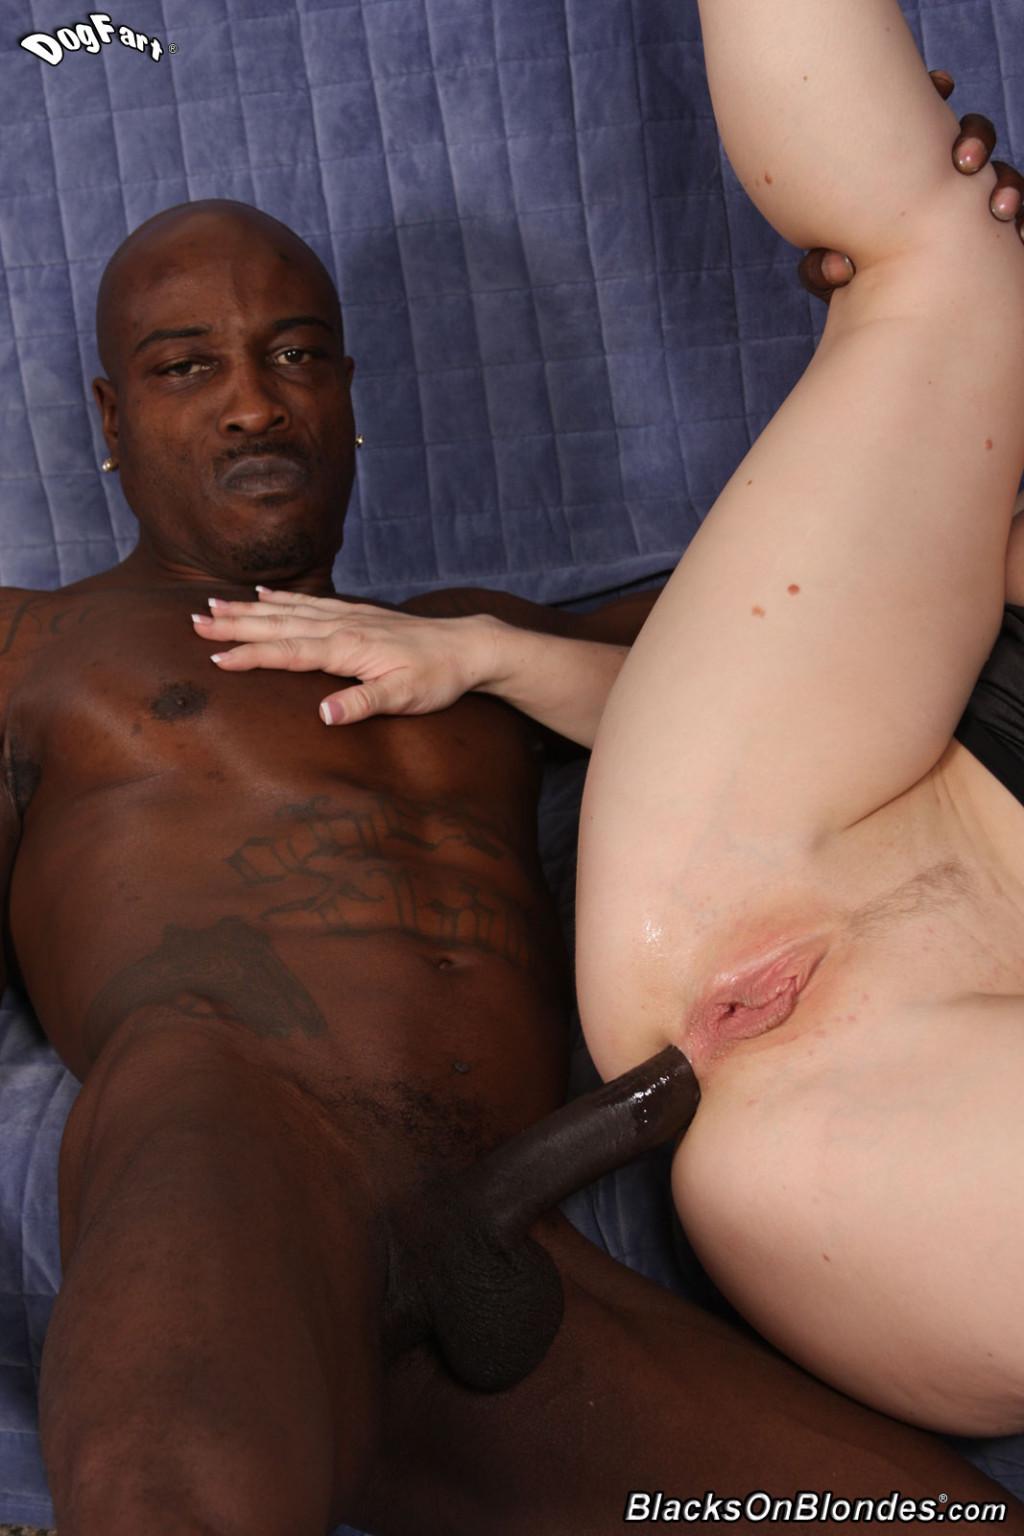 vihen-kom-porno